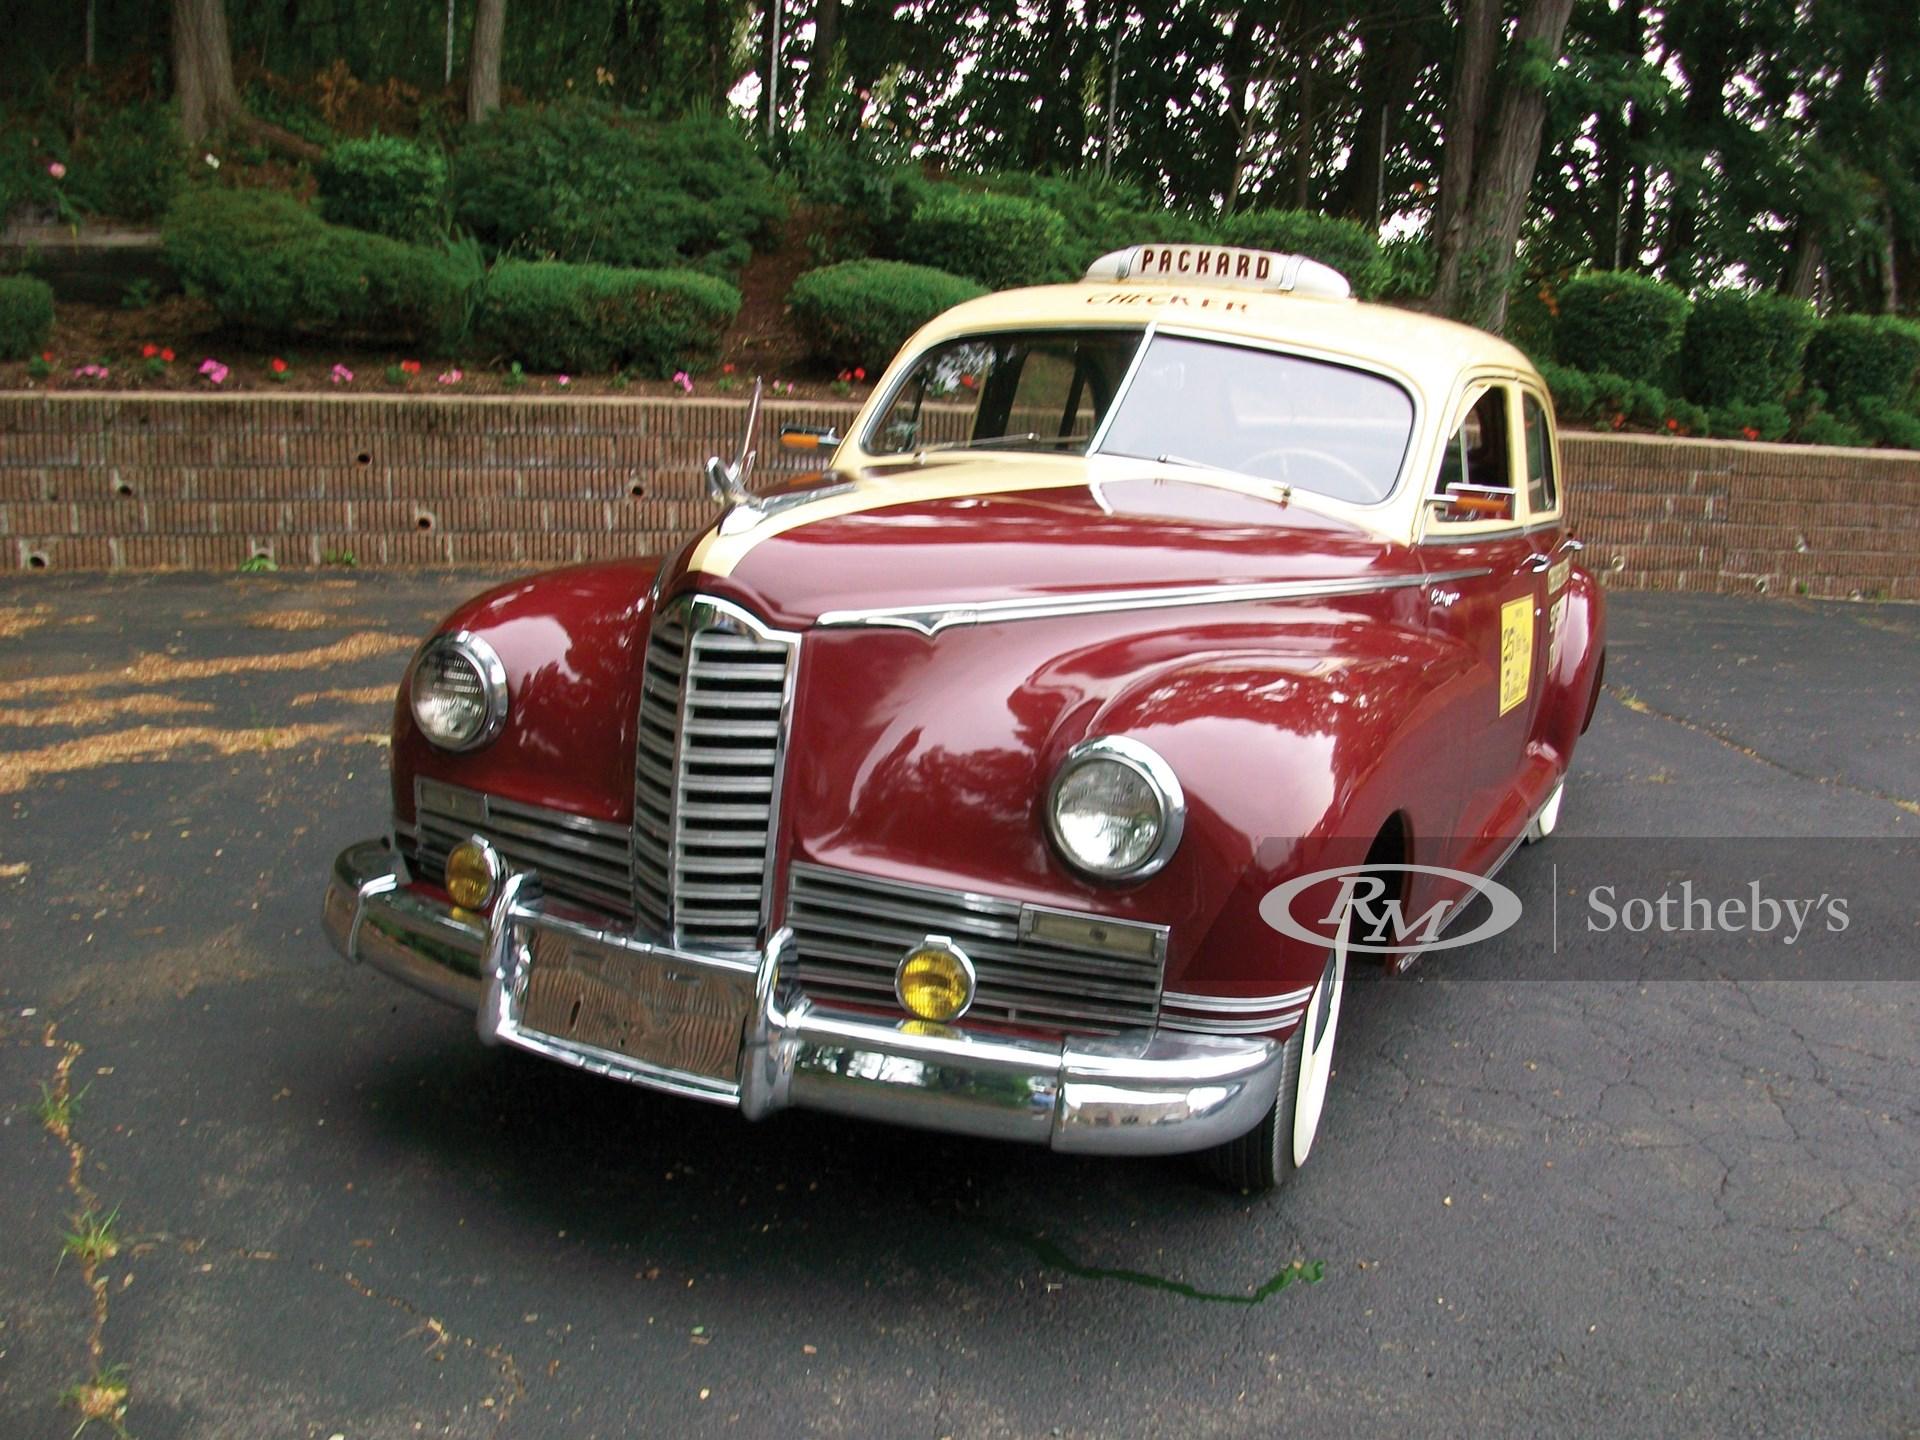 1947 Packard Clipper Taxi